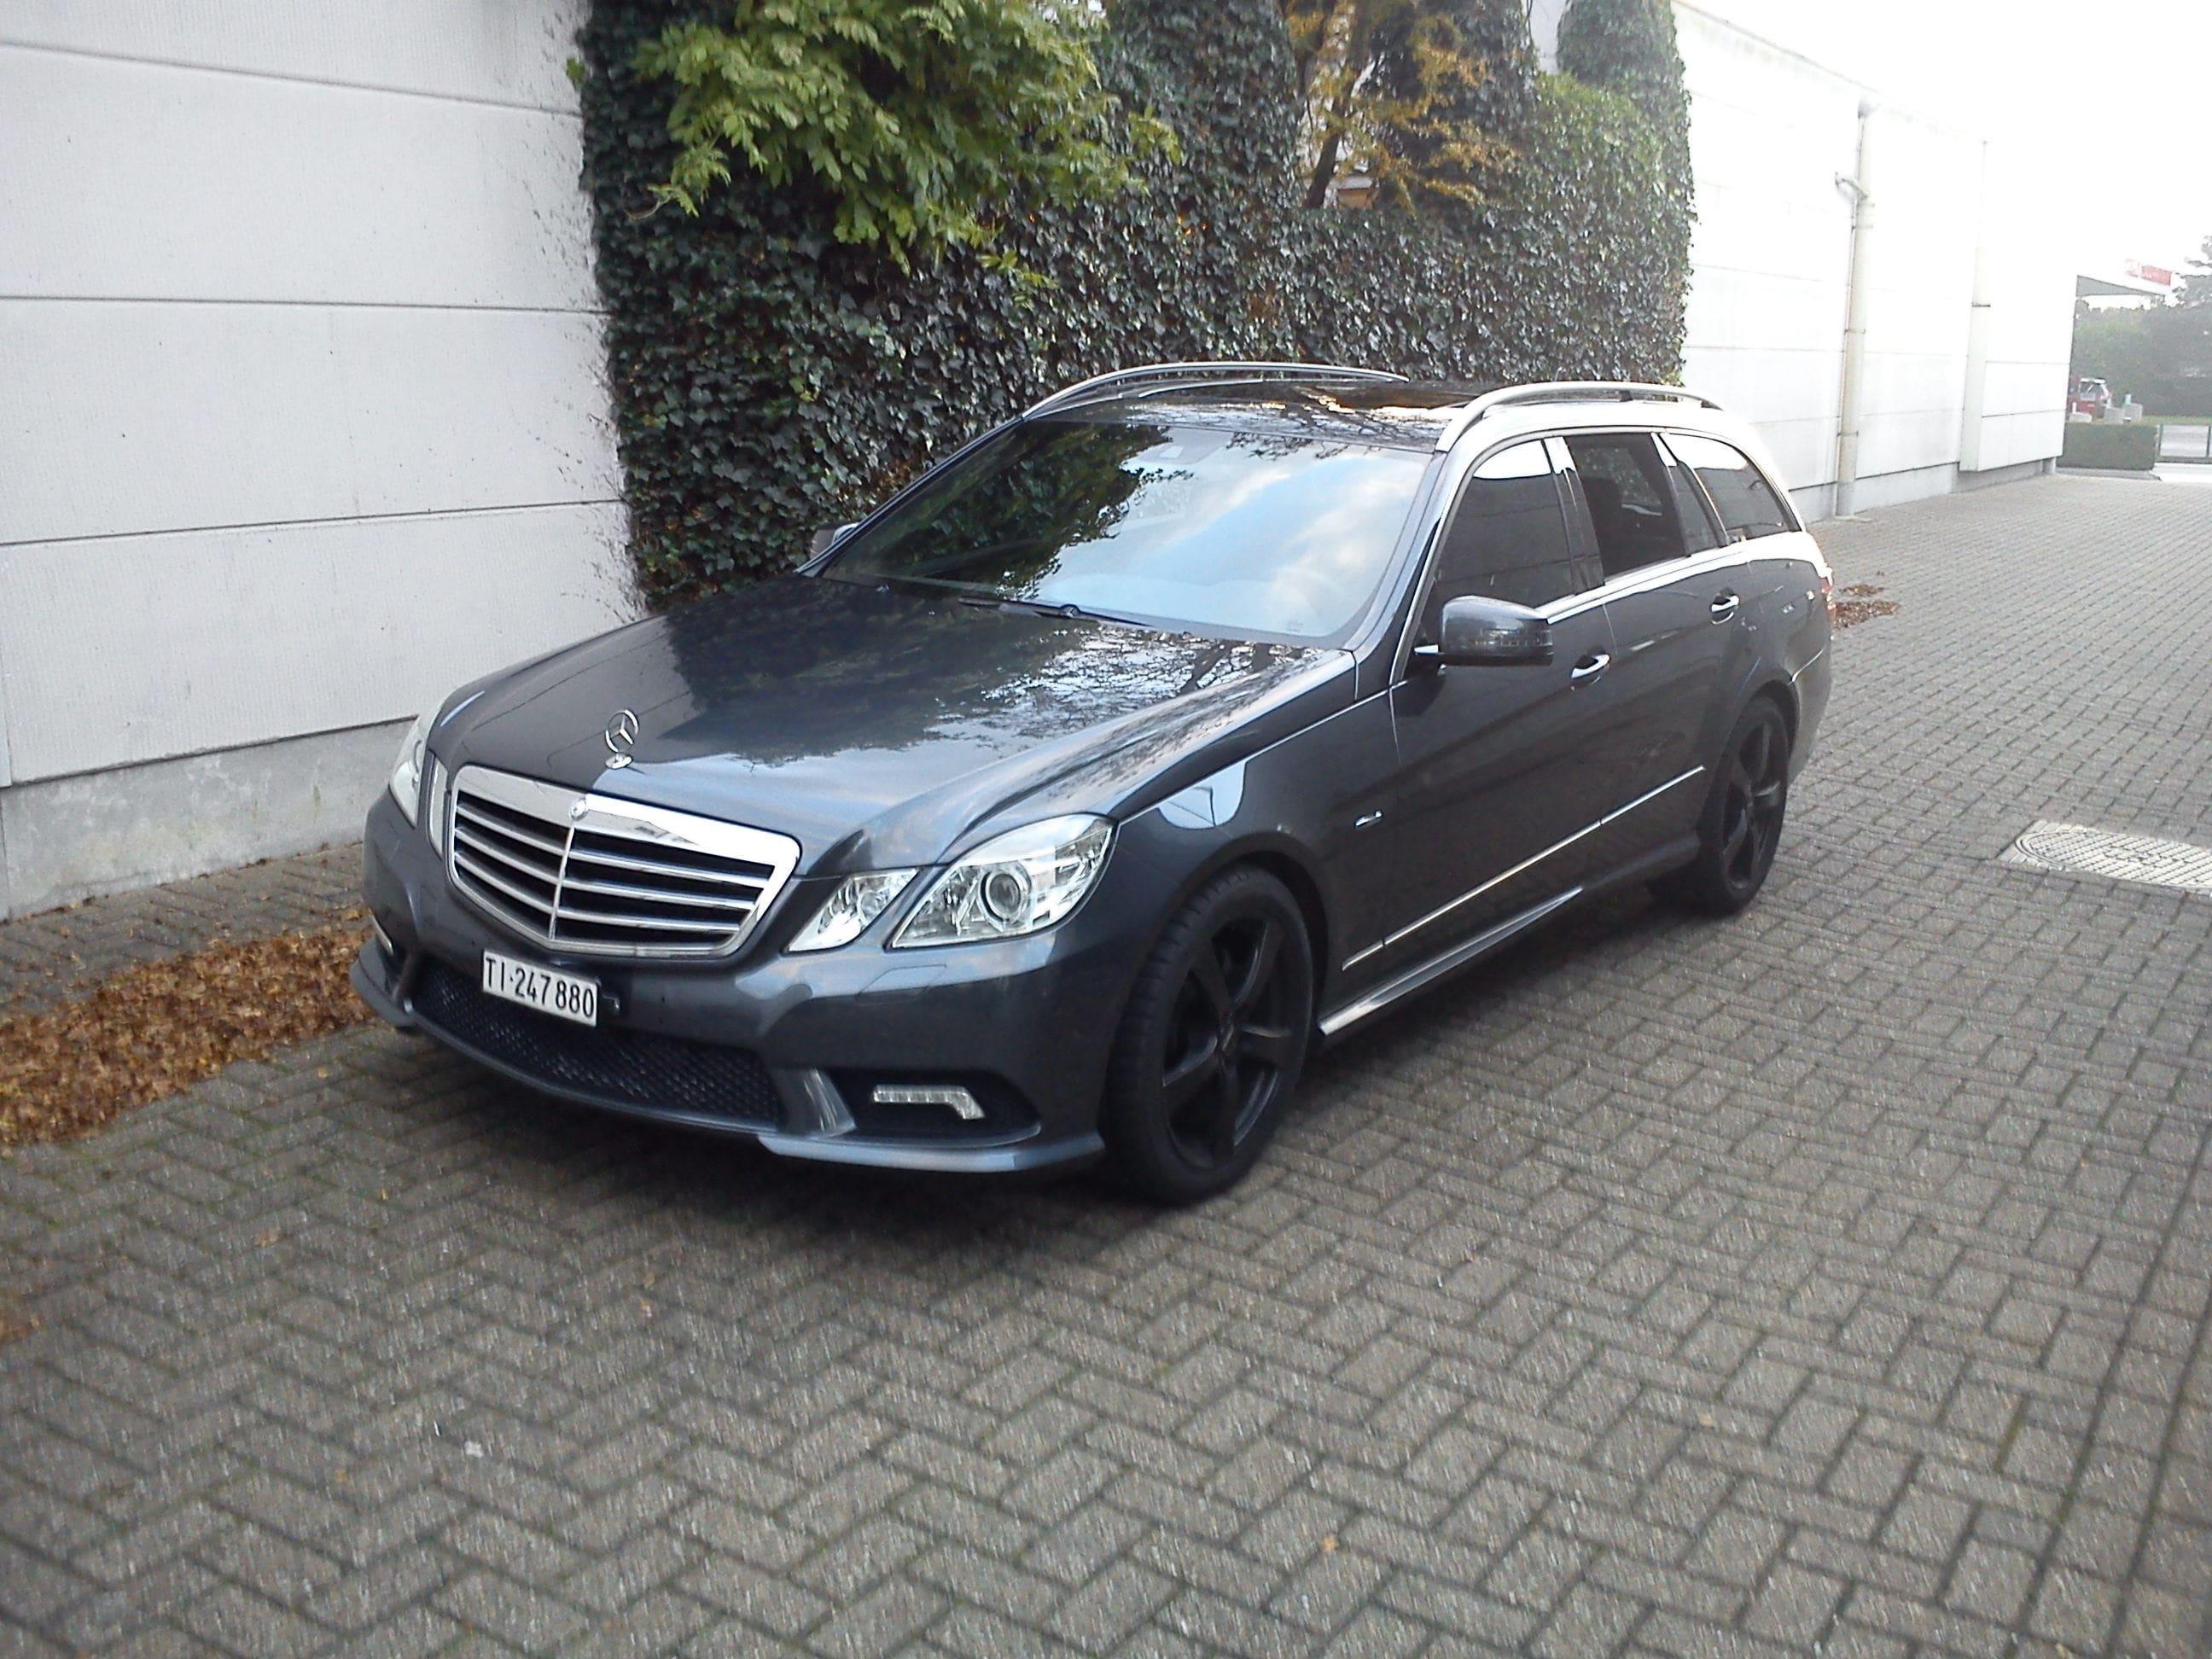 Mercedes E320 met Mat Zwarte Wrap, Carwrapping door Wrapmyride.nu Foto-nr:6223, ©2020